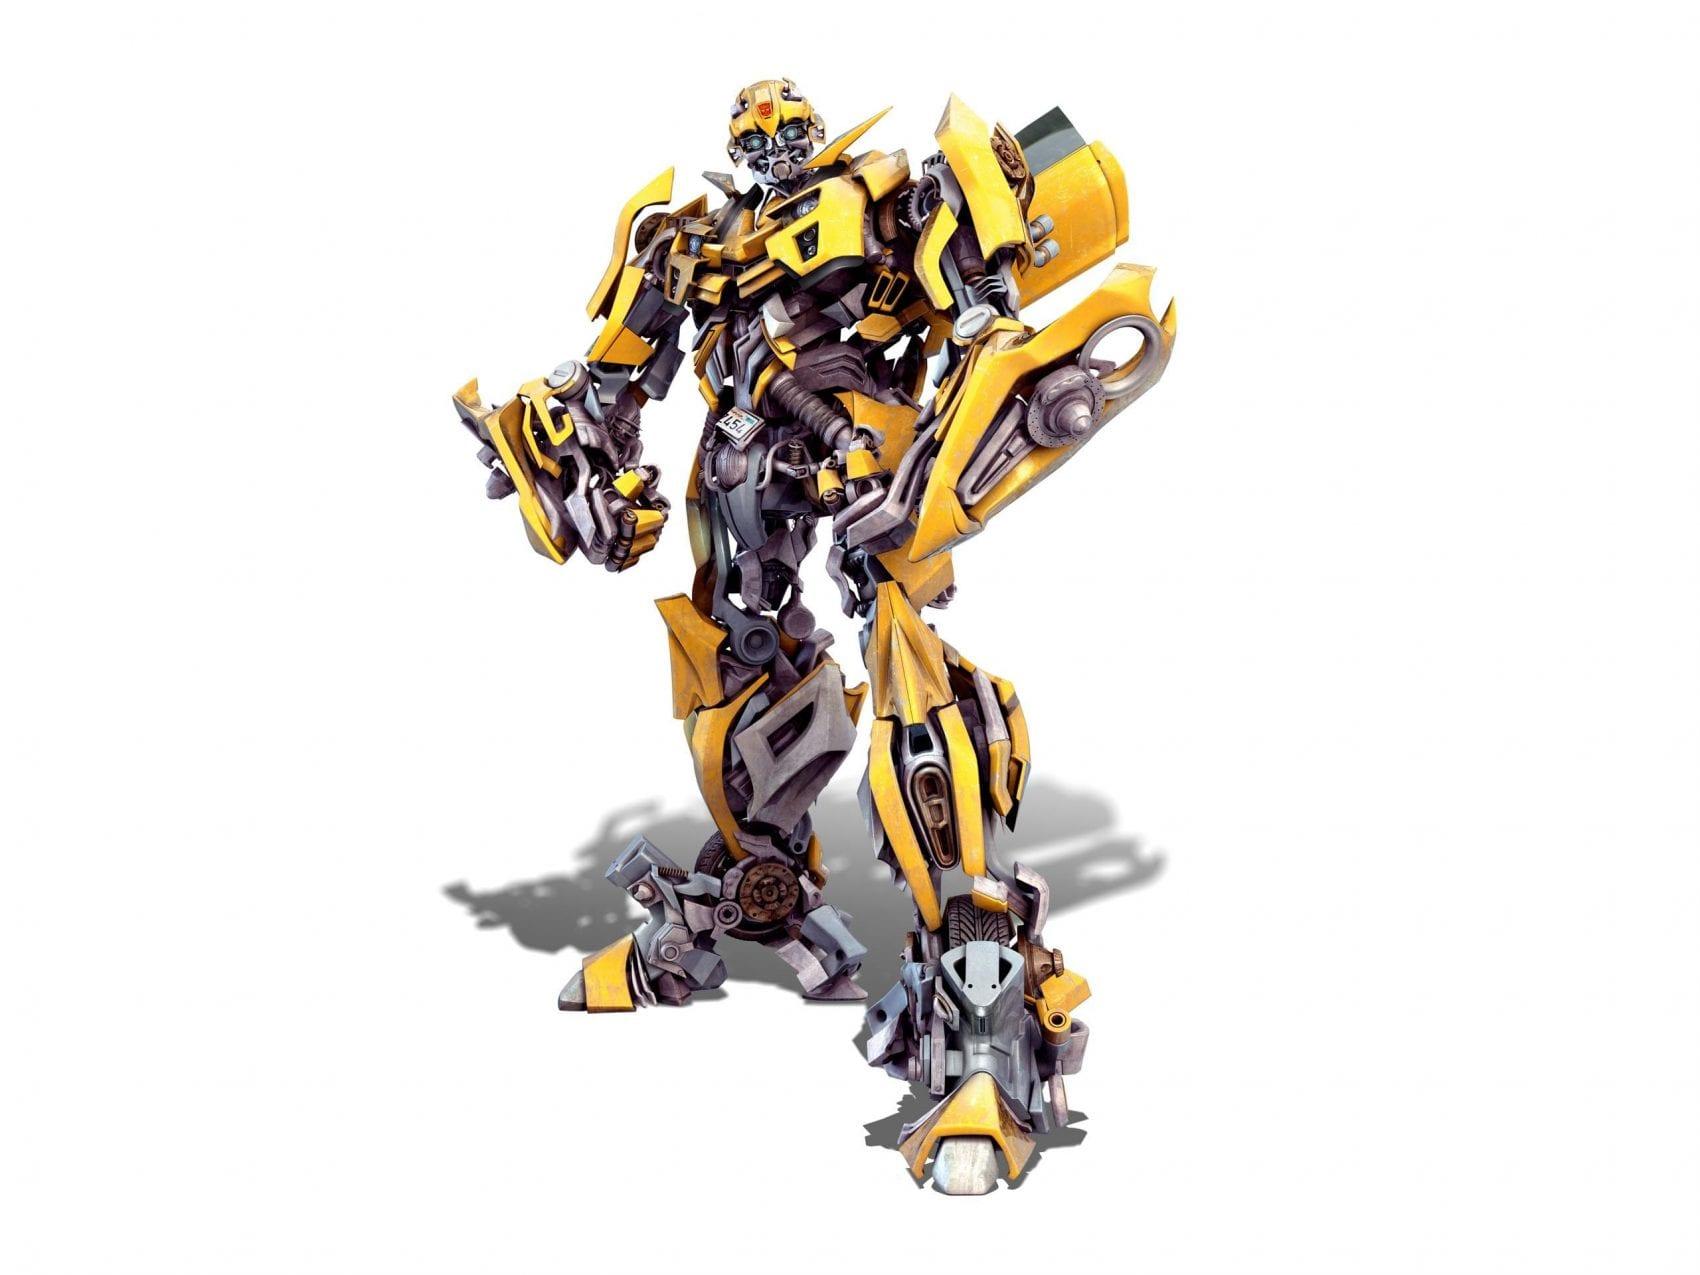 Transformers 5 The Last Knight News My Geek Actu